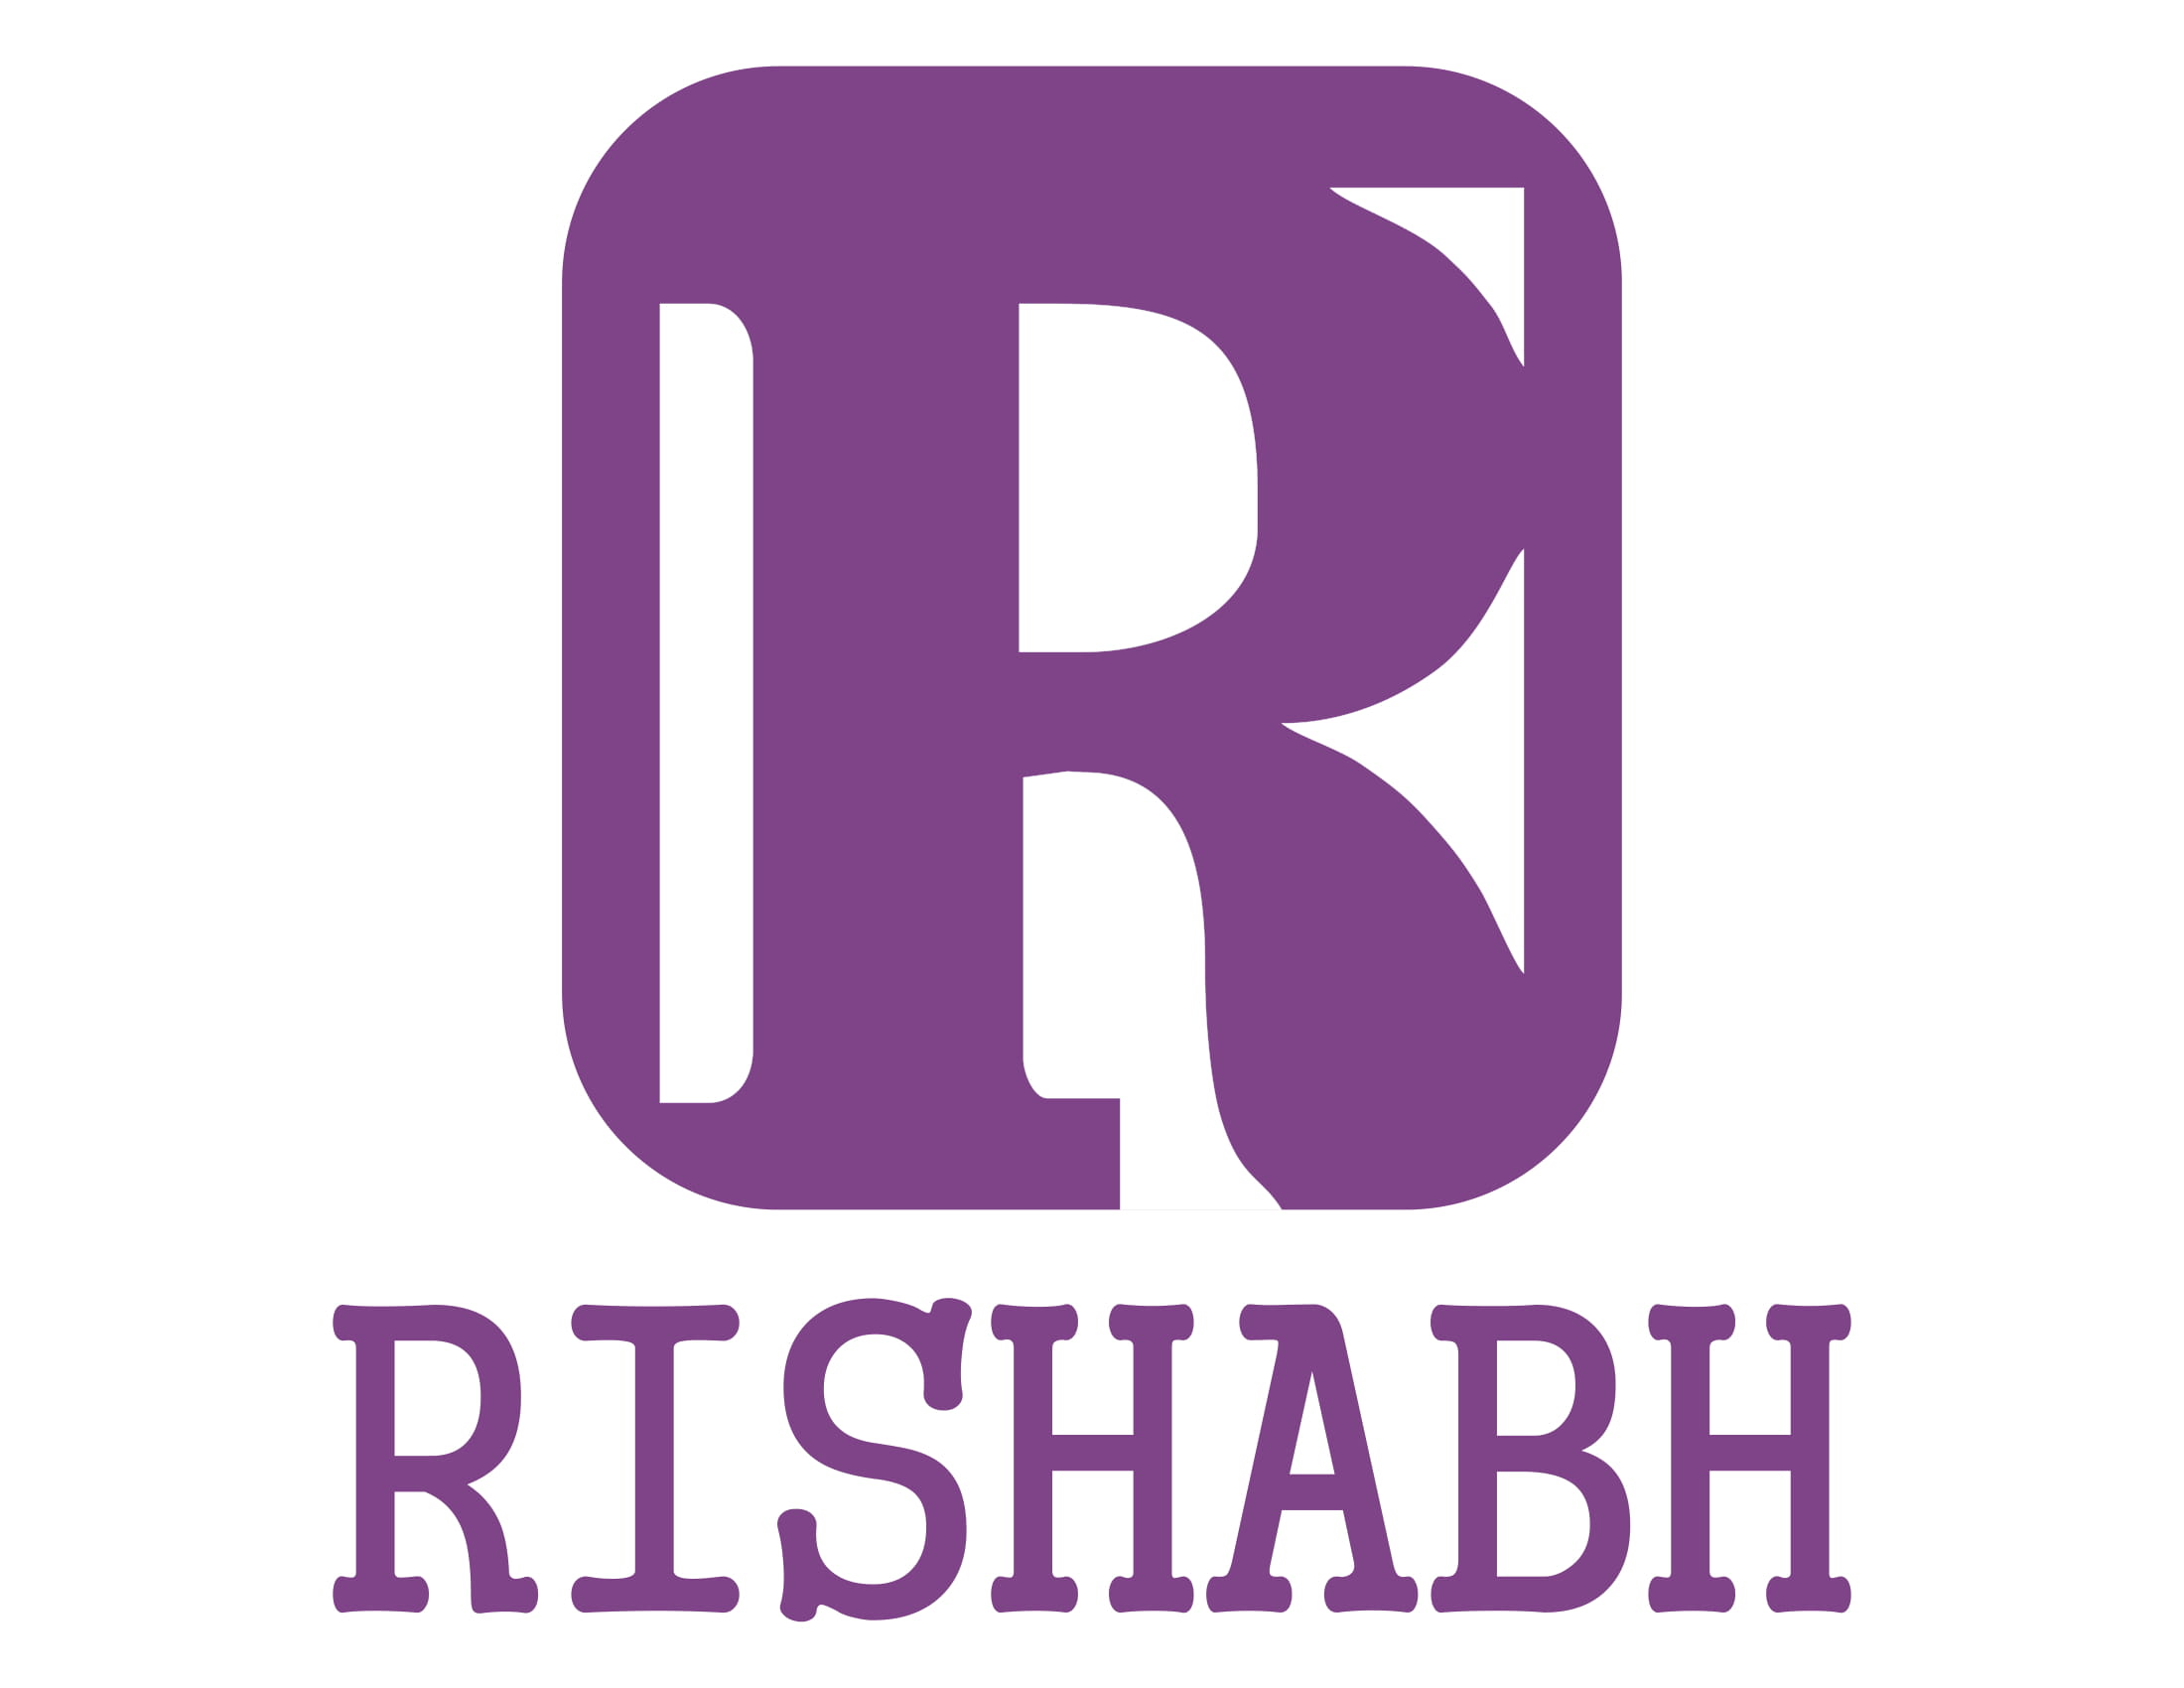 RISAv